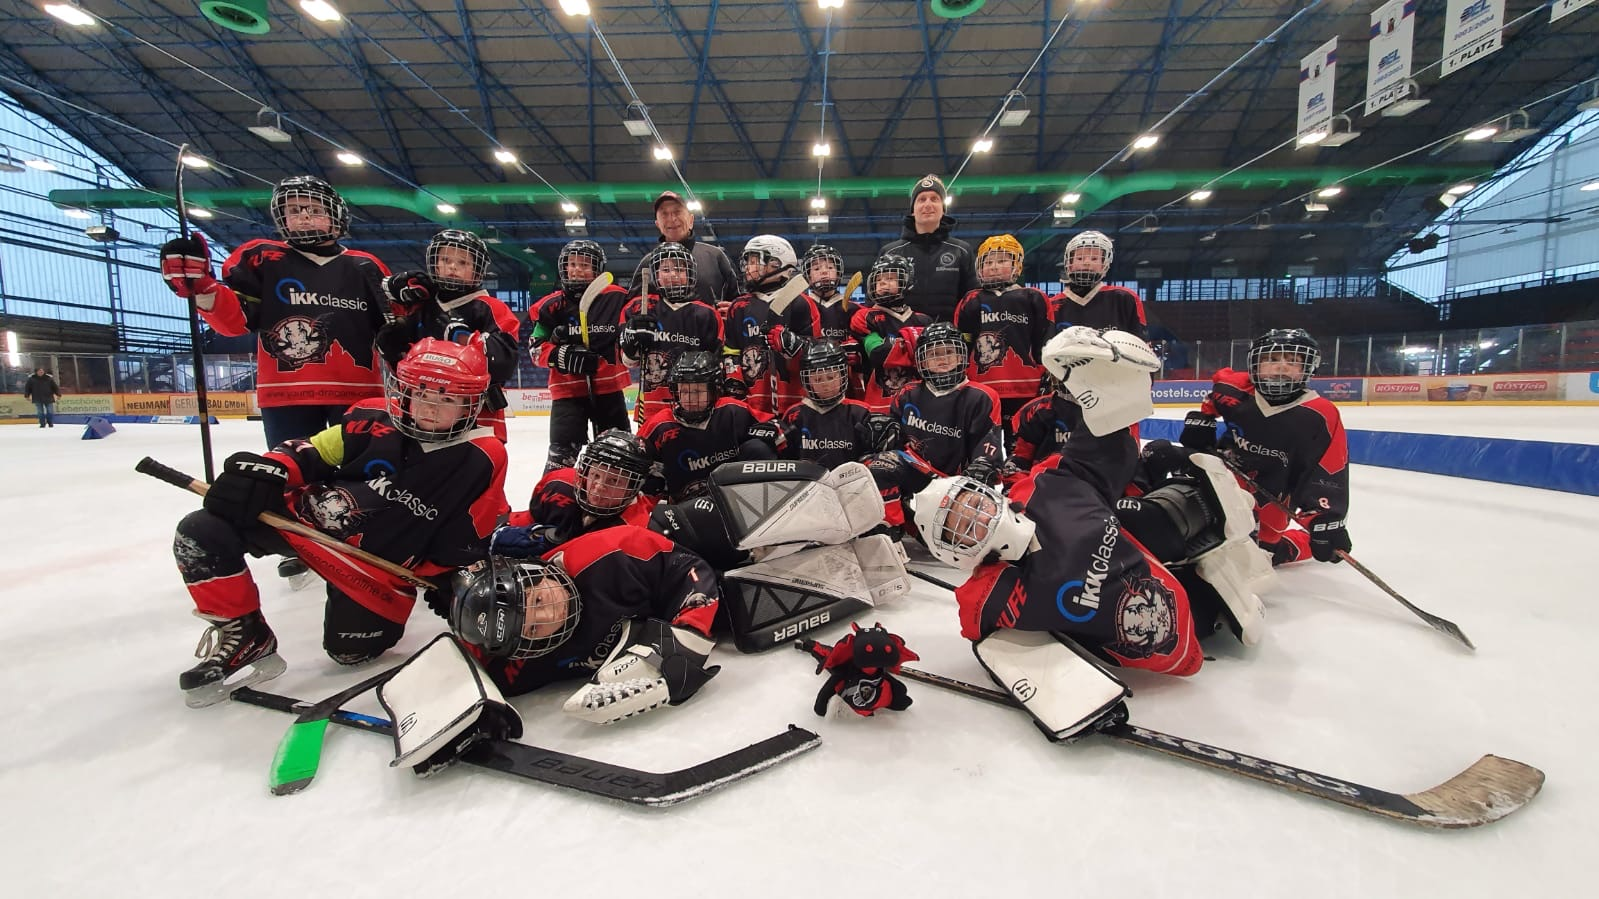 Eishockey Verein Erfurt